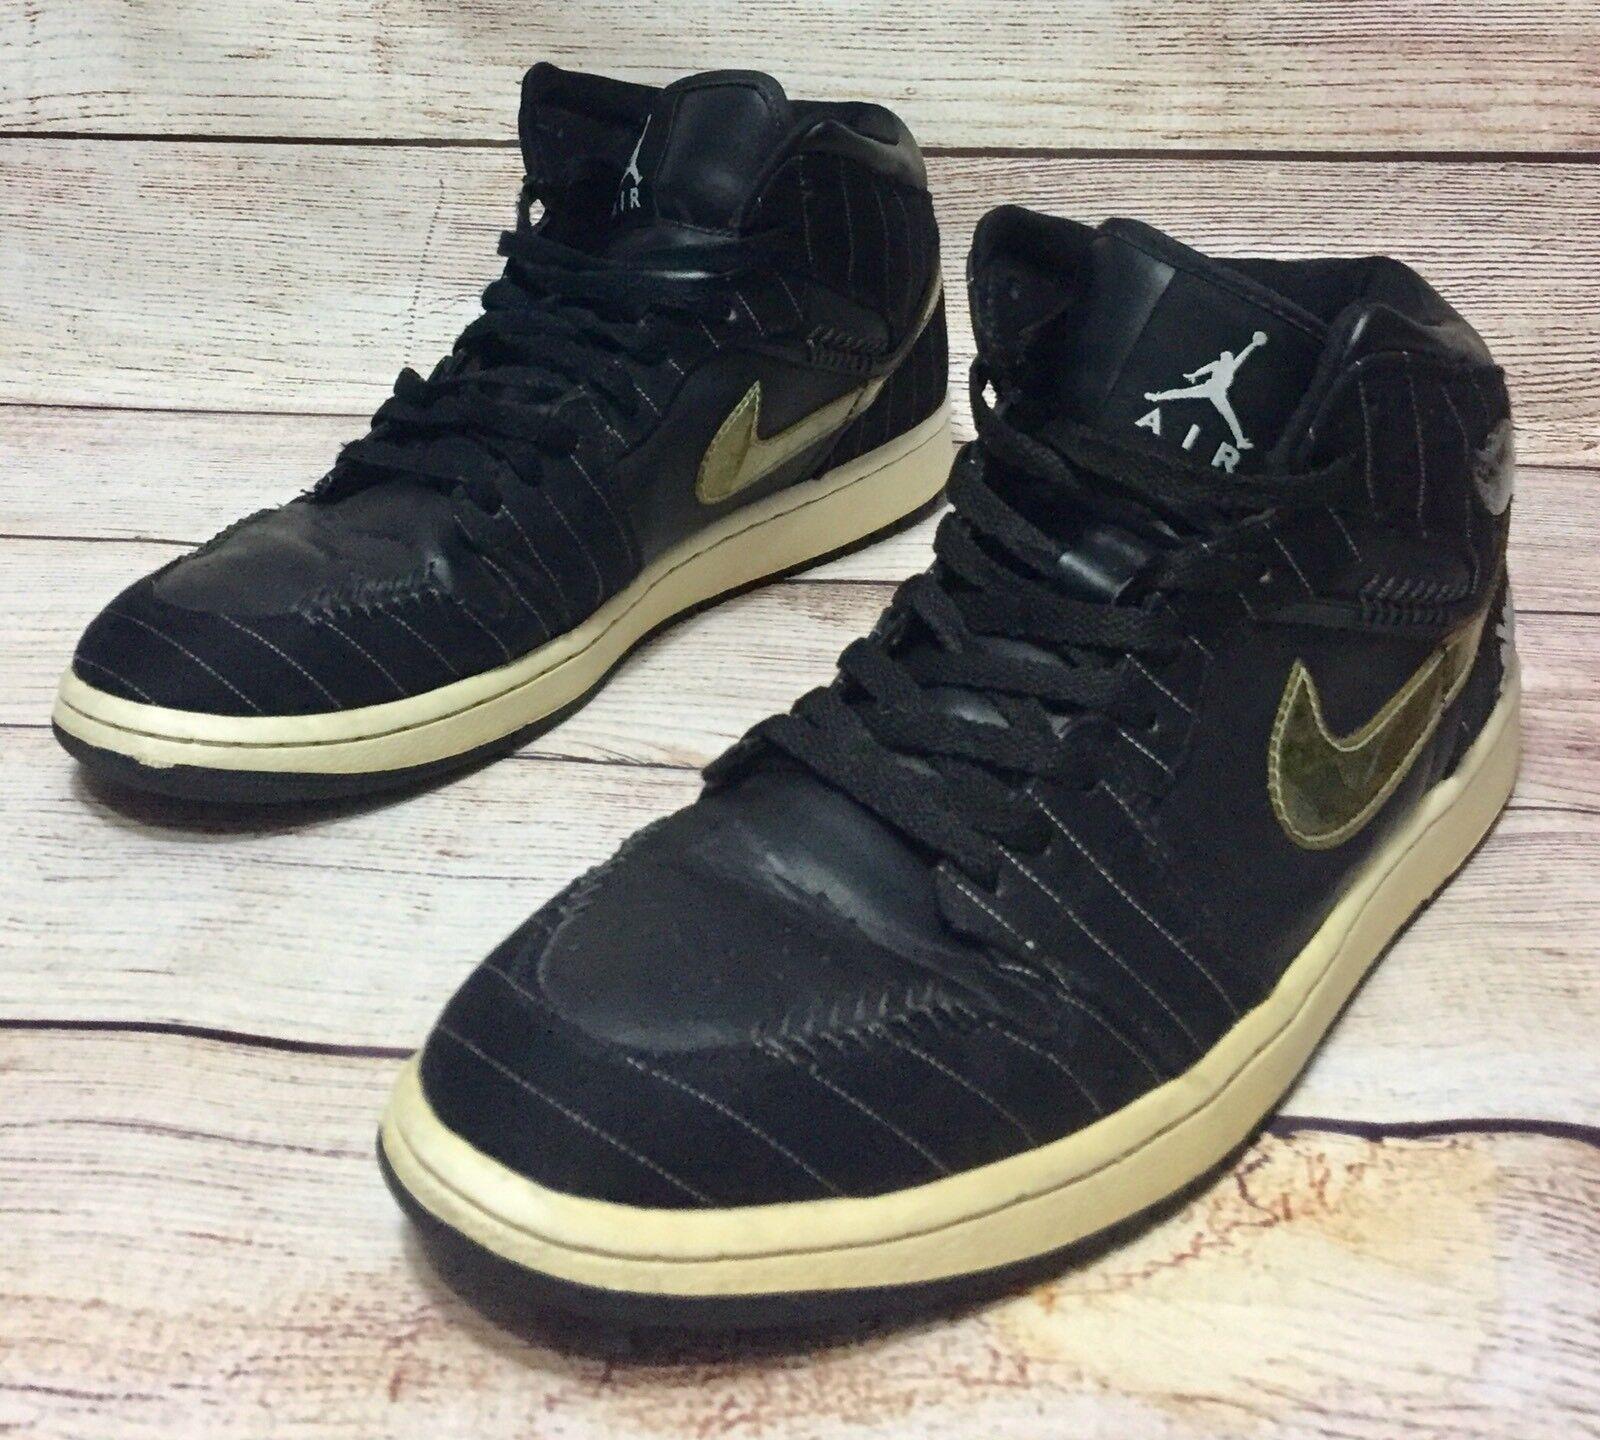 Nike Air Jordan 1 Retro Uomo 13 Birmingham Barons Opening Day Shoes 325514-012